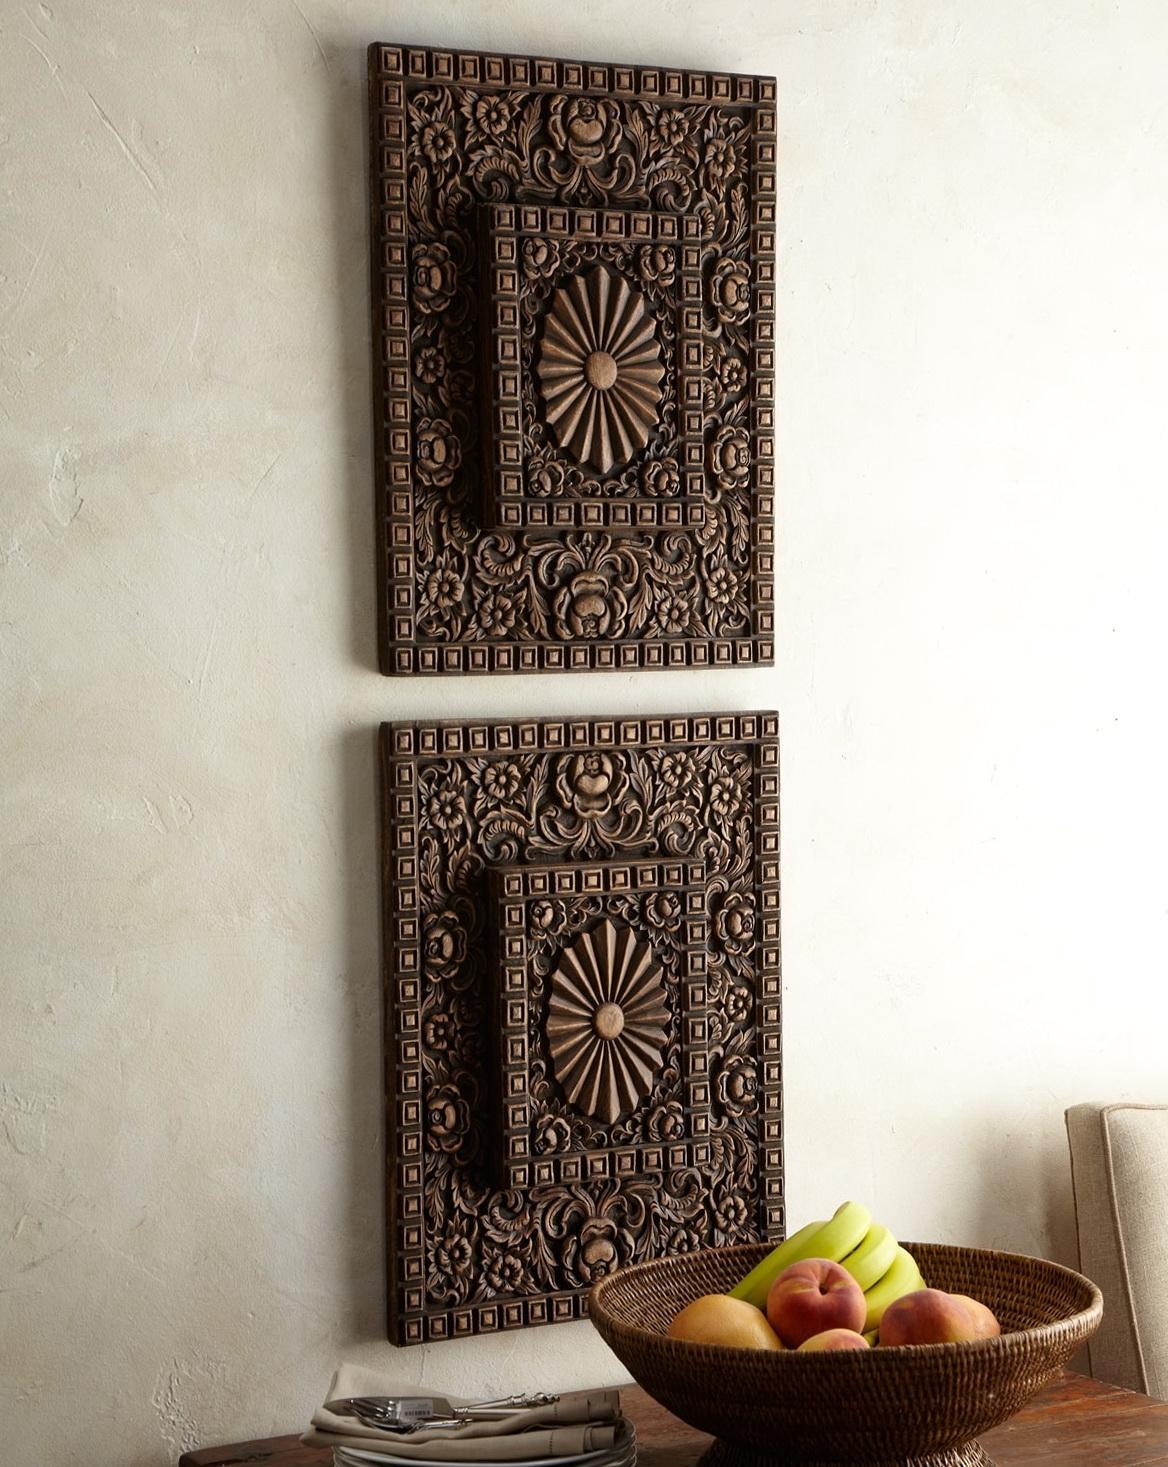 Sofa Ideas. Asian Wall Decor - Best Home Design Interior 2018 inside Asian Wall Art (Image 18 of 20)